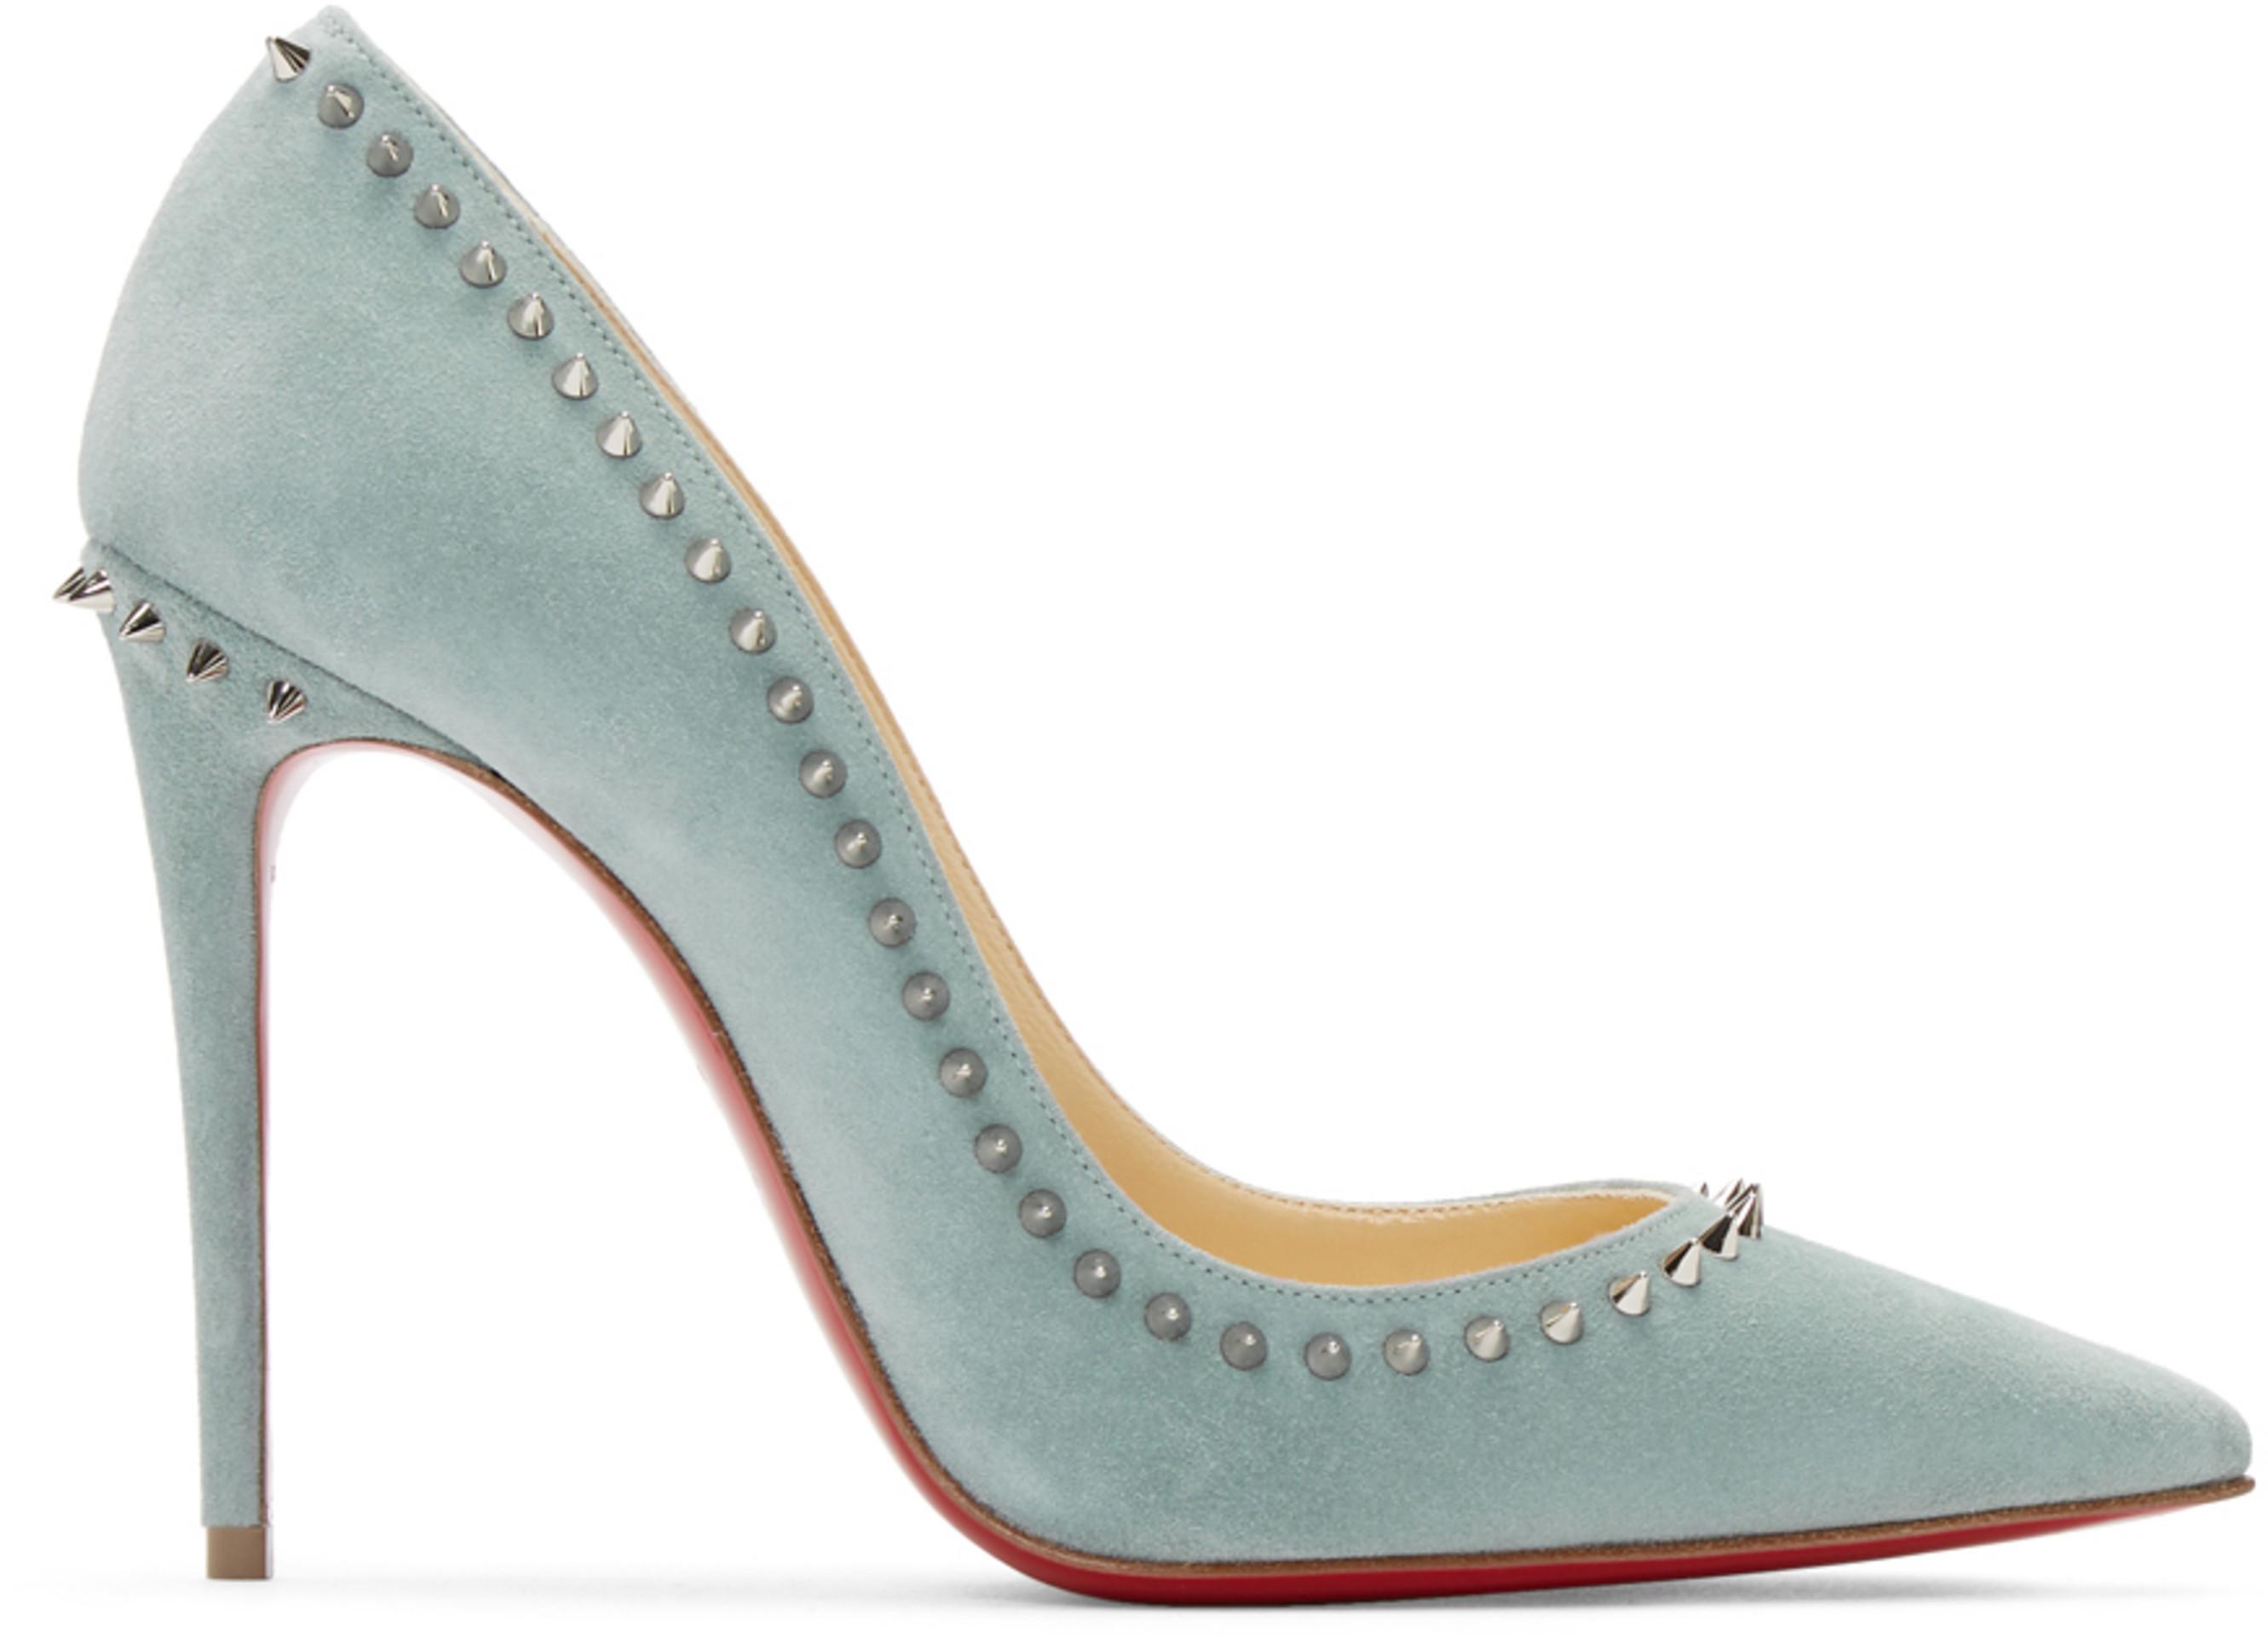 promo code 940f1 db4eb Blue Anjalina 100 Heels